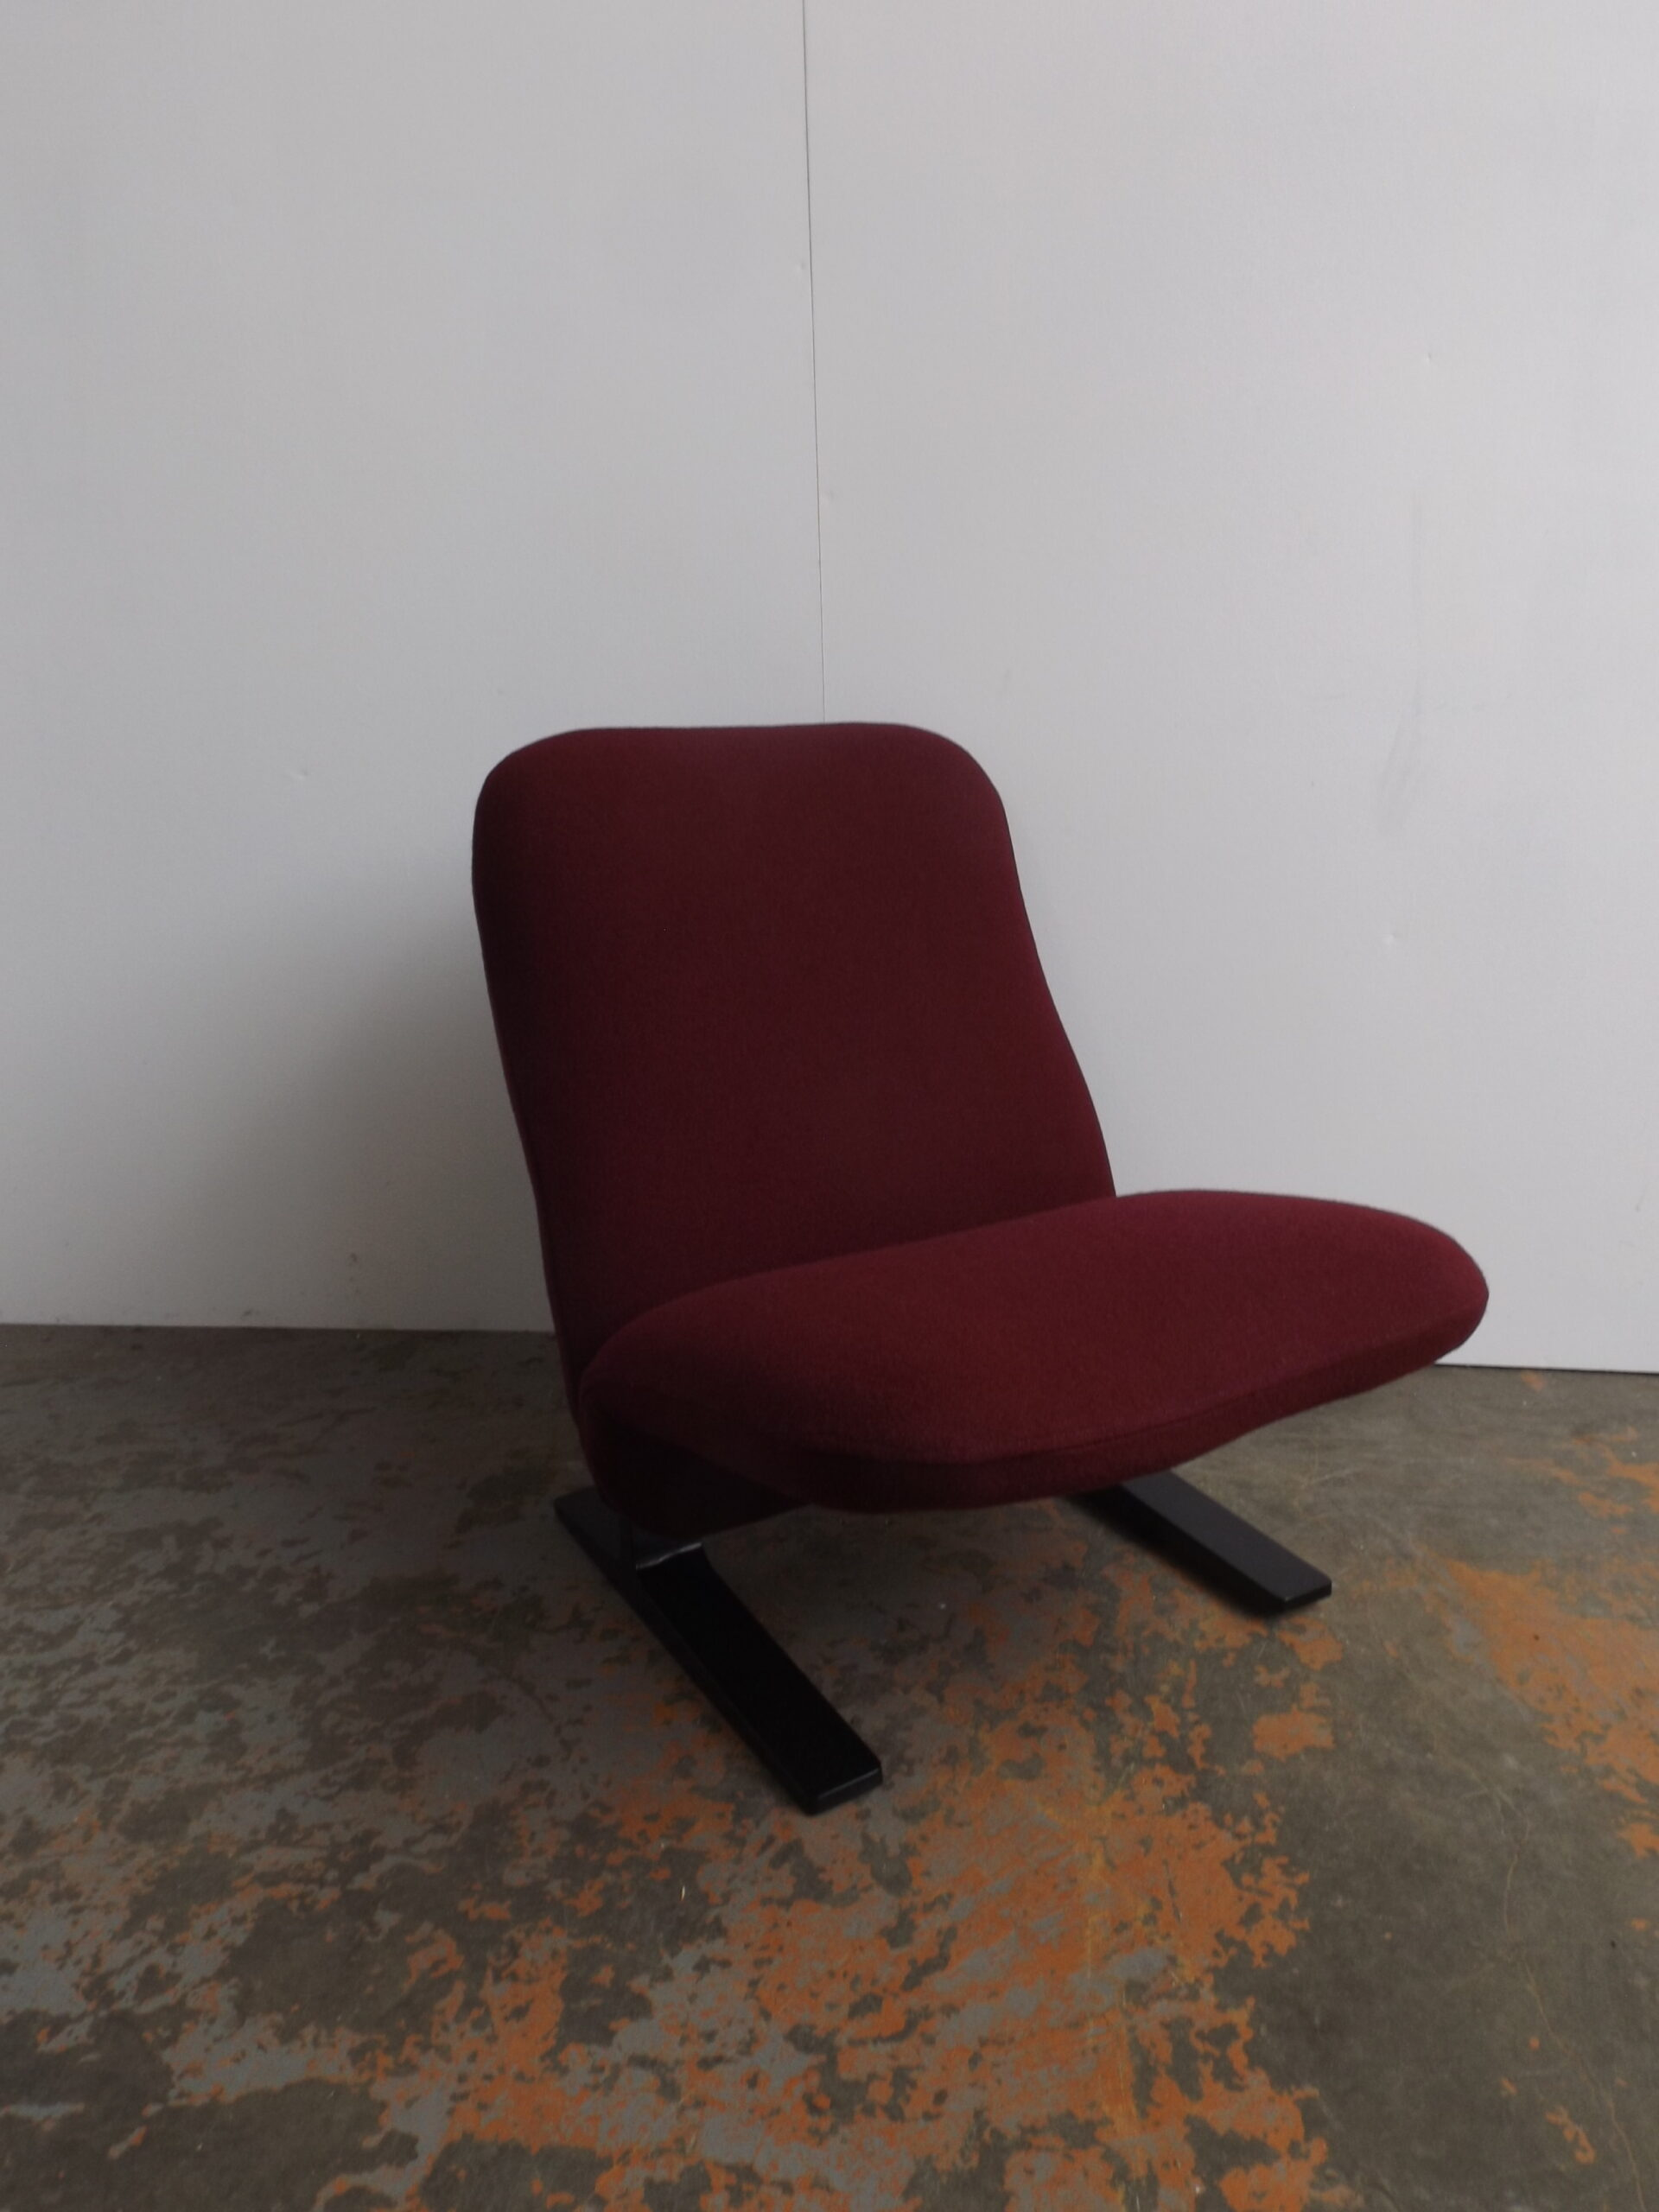 Concorde chair Pierre Paulin